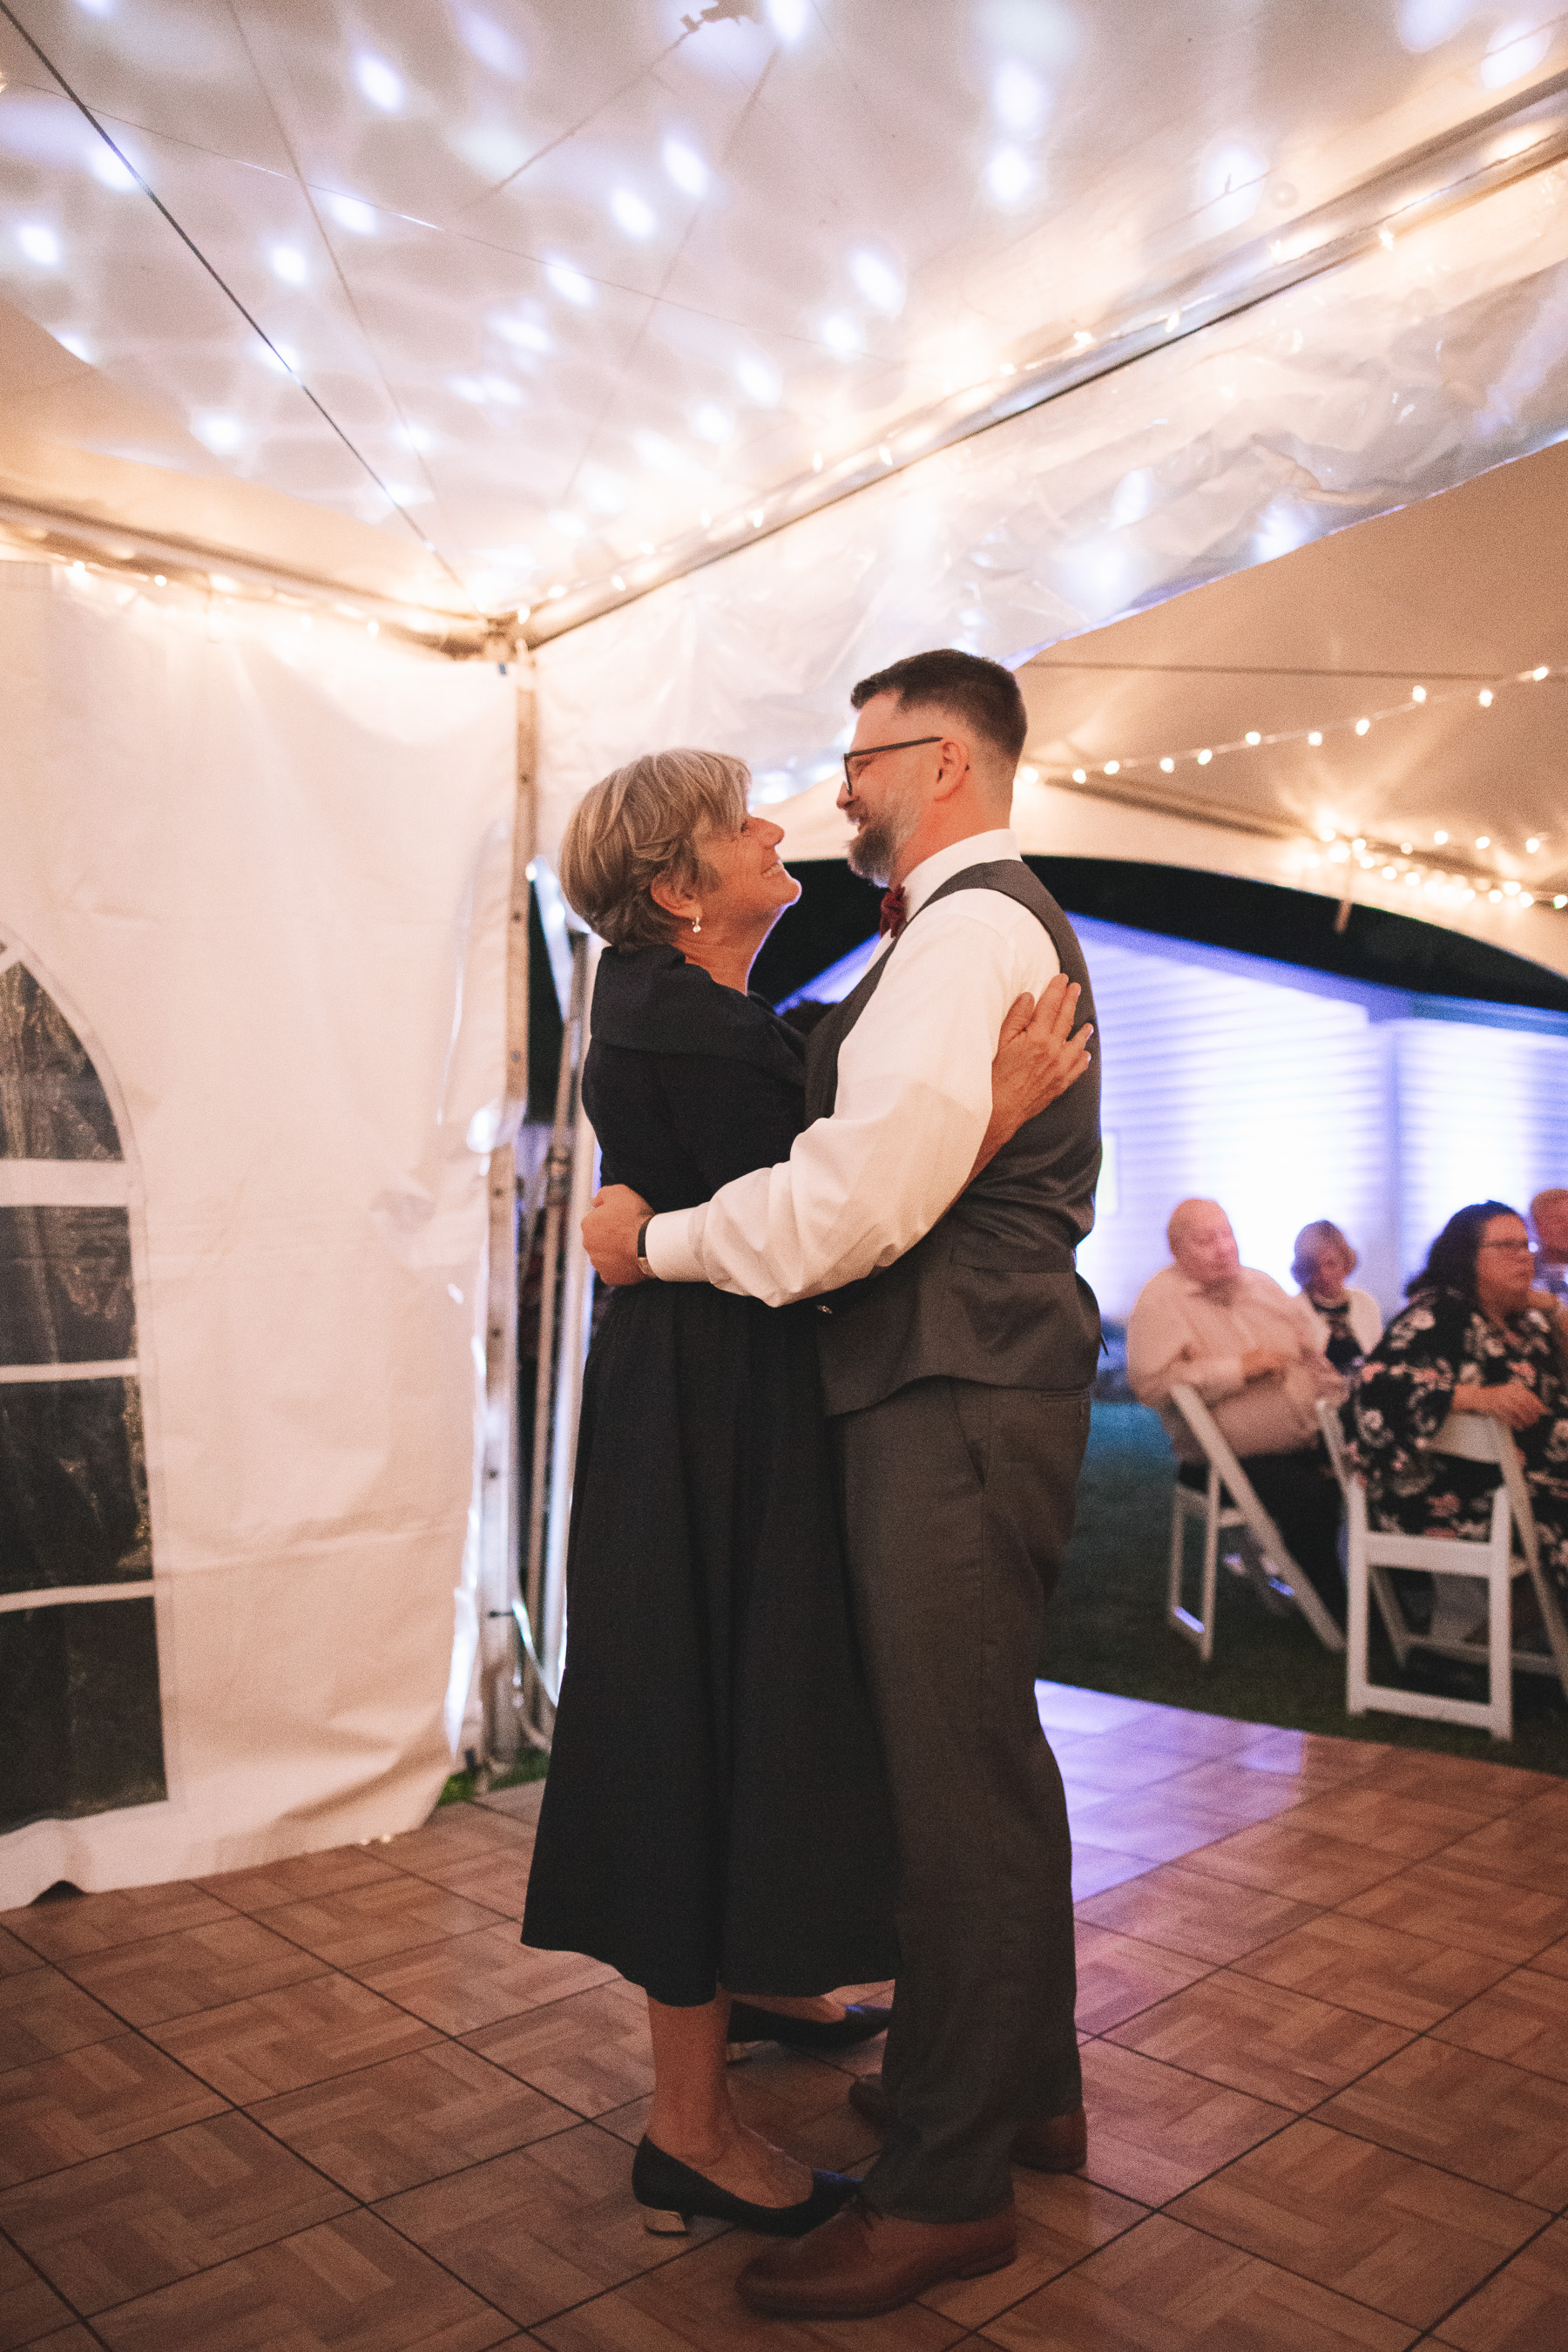 wedding reception during covid | Charlie and Shirleys Wedding